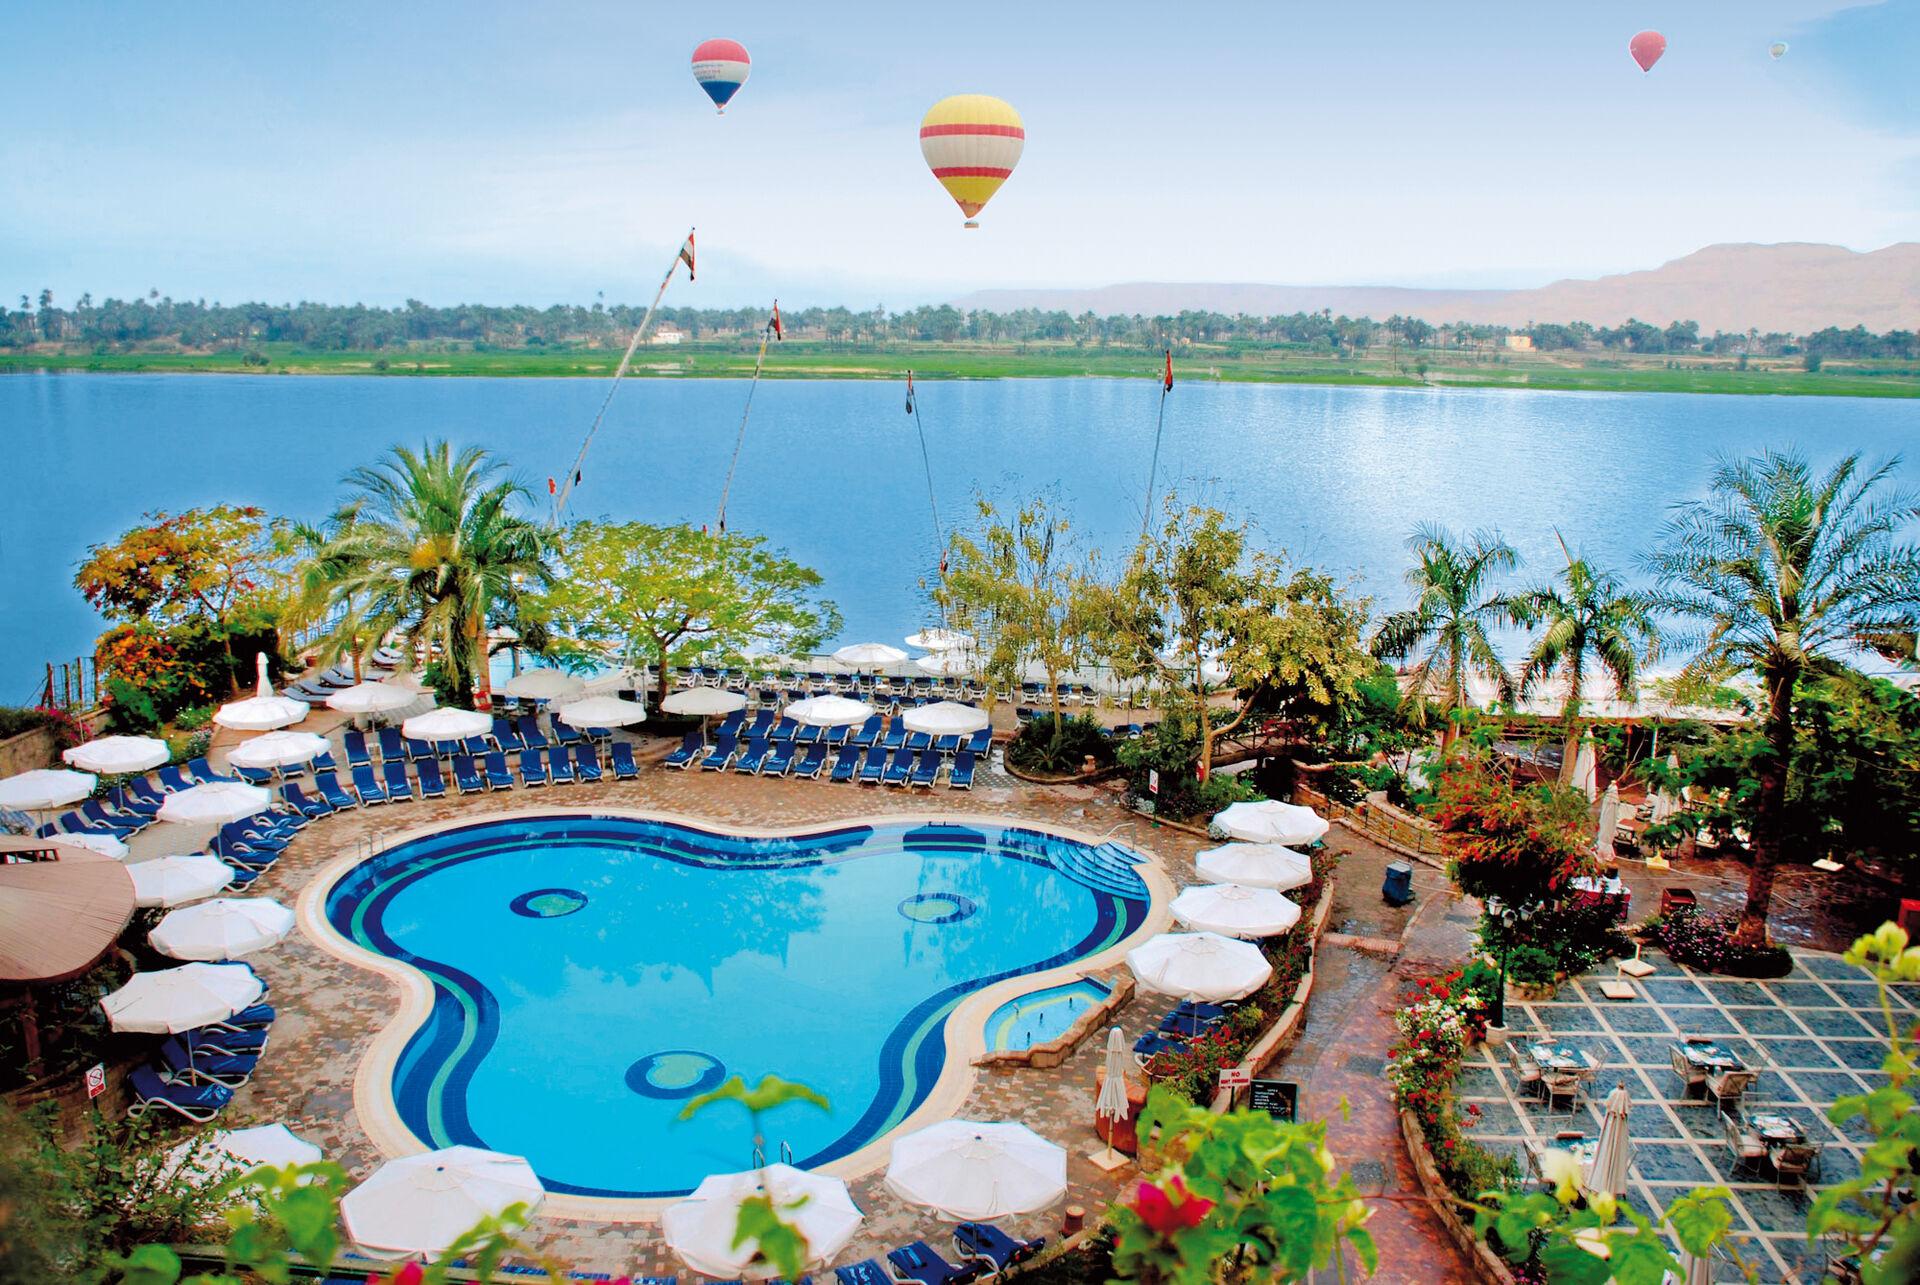 Steigenberger Nile Palace Luxor